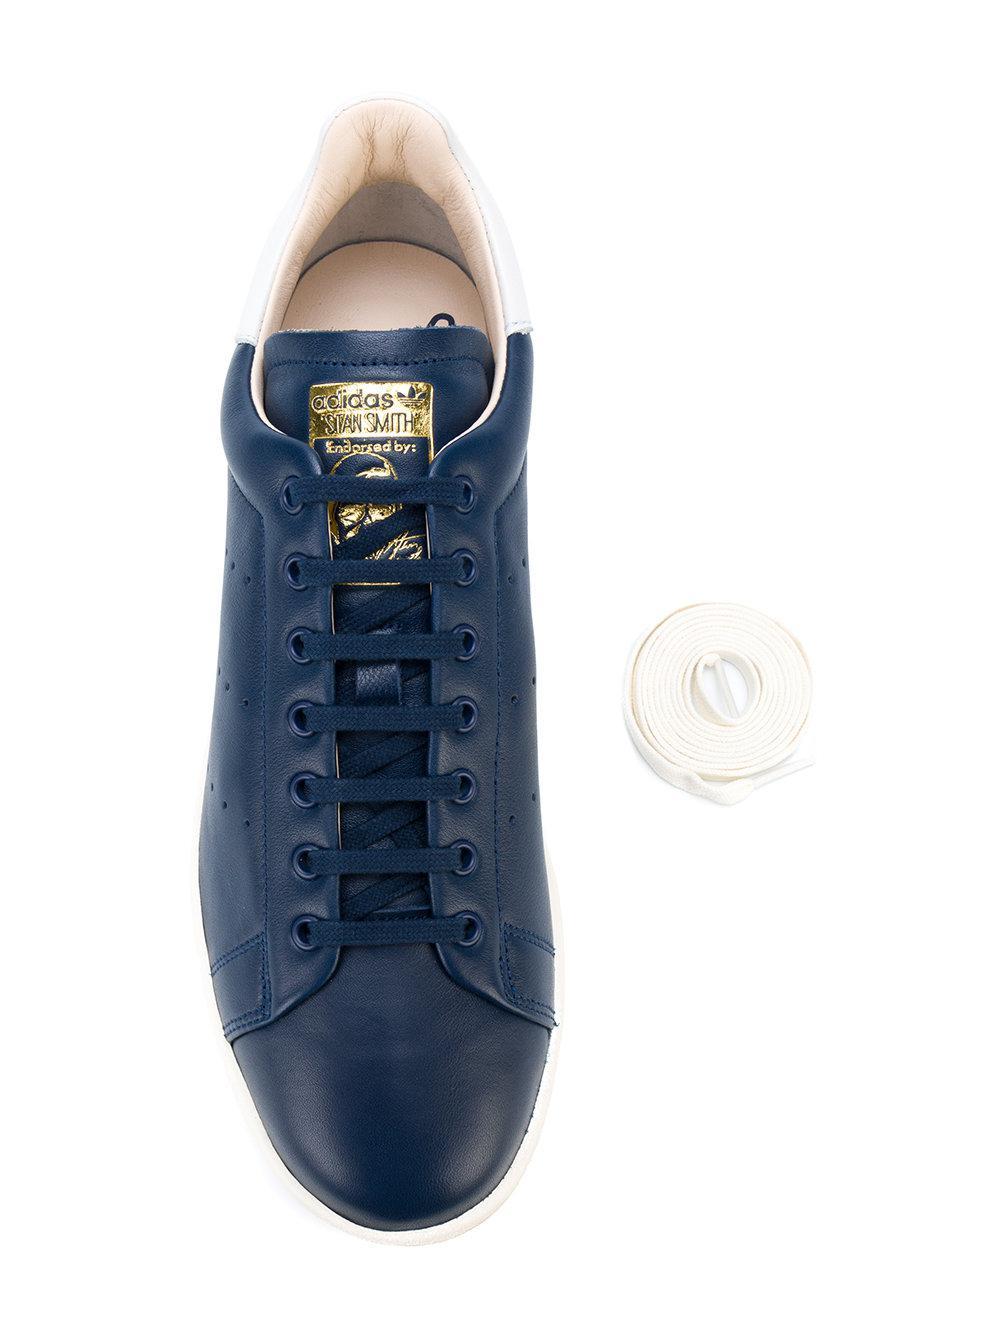 new arrivals 65f57 cc45f adidas-blue-Originals-Stan-Smith-Recon-Sneakers.jpeg